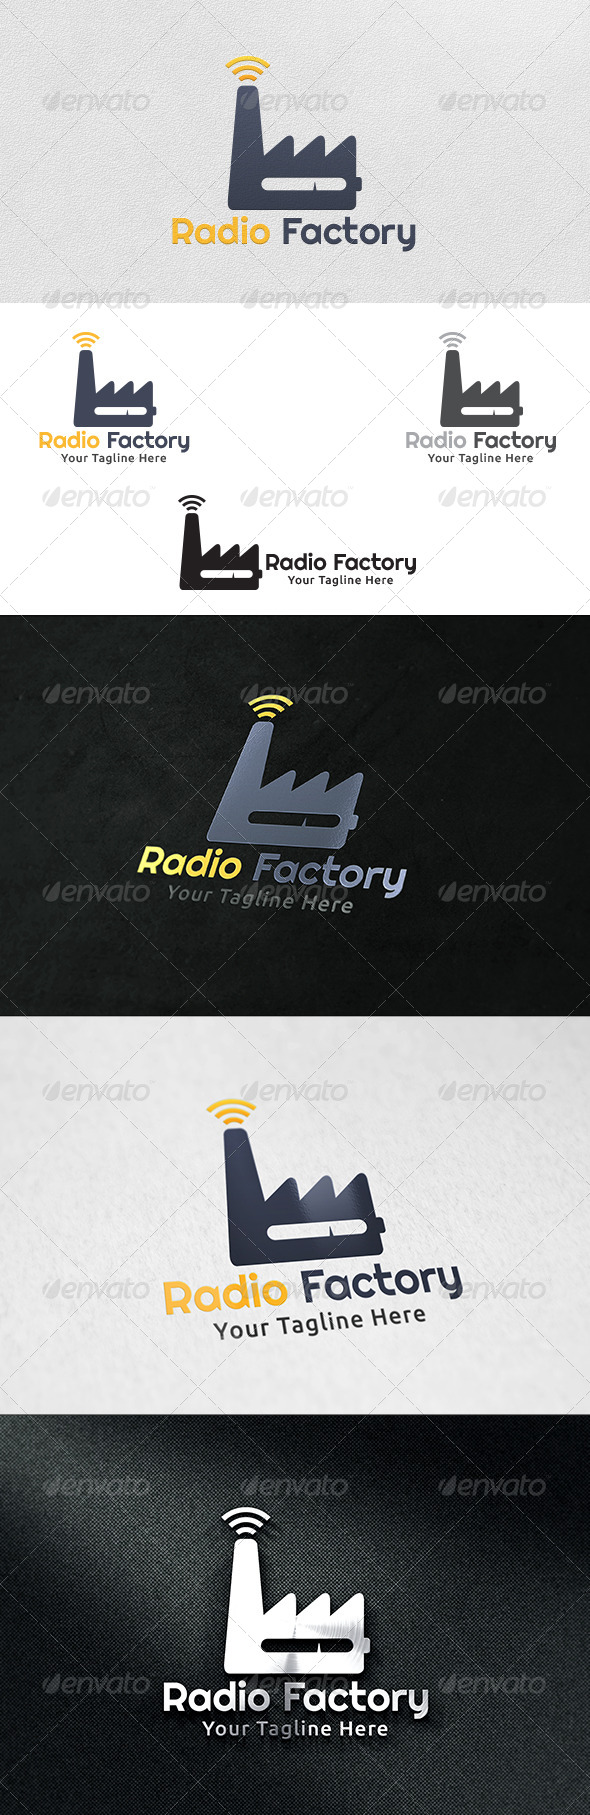 GraphicRiver Radio Factory Logo Template 6205260